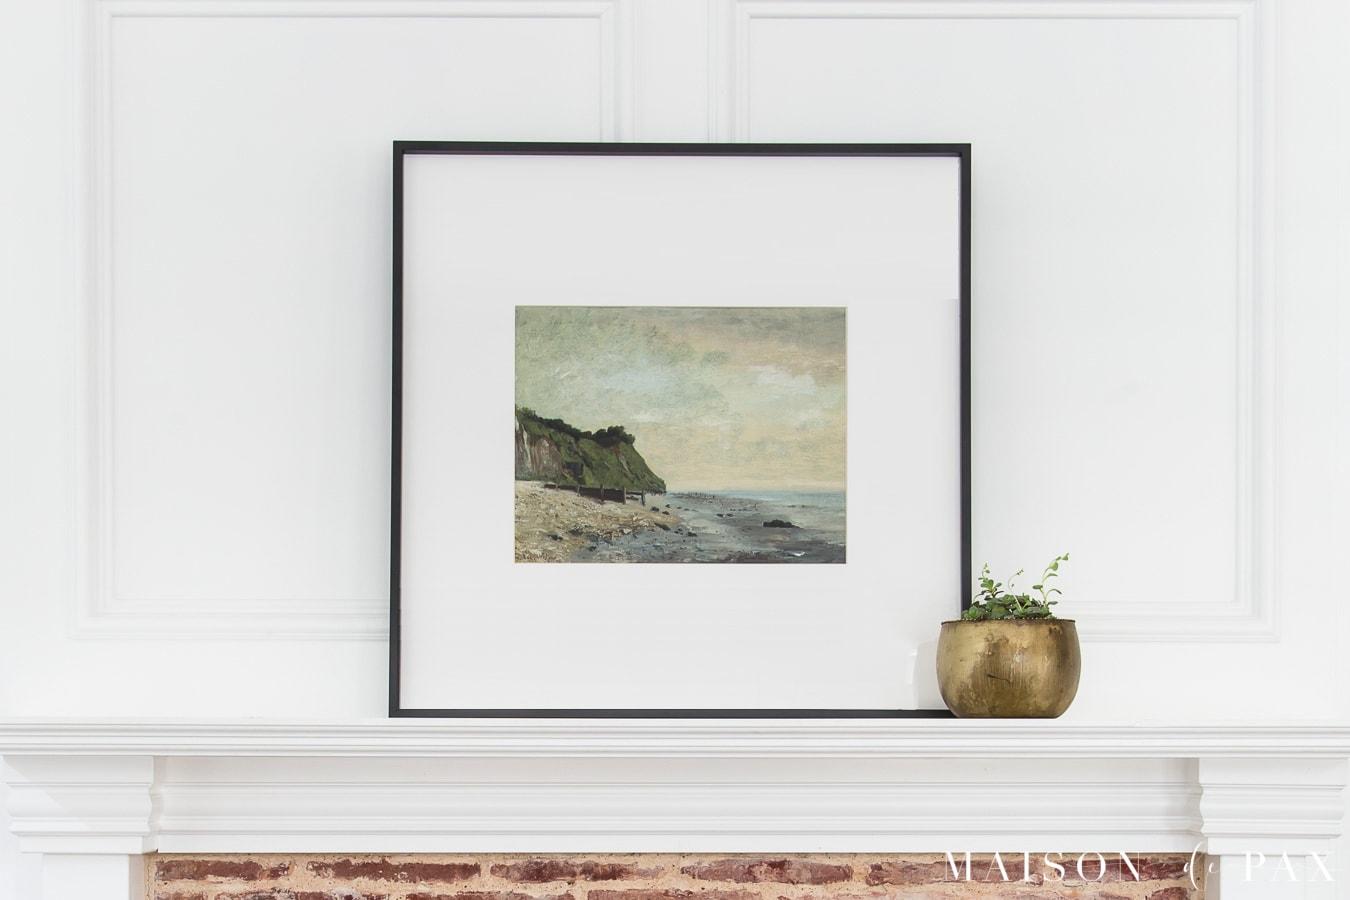 beach print in black frame above mantel | Maison de Pax